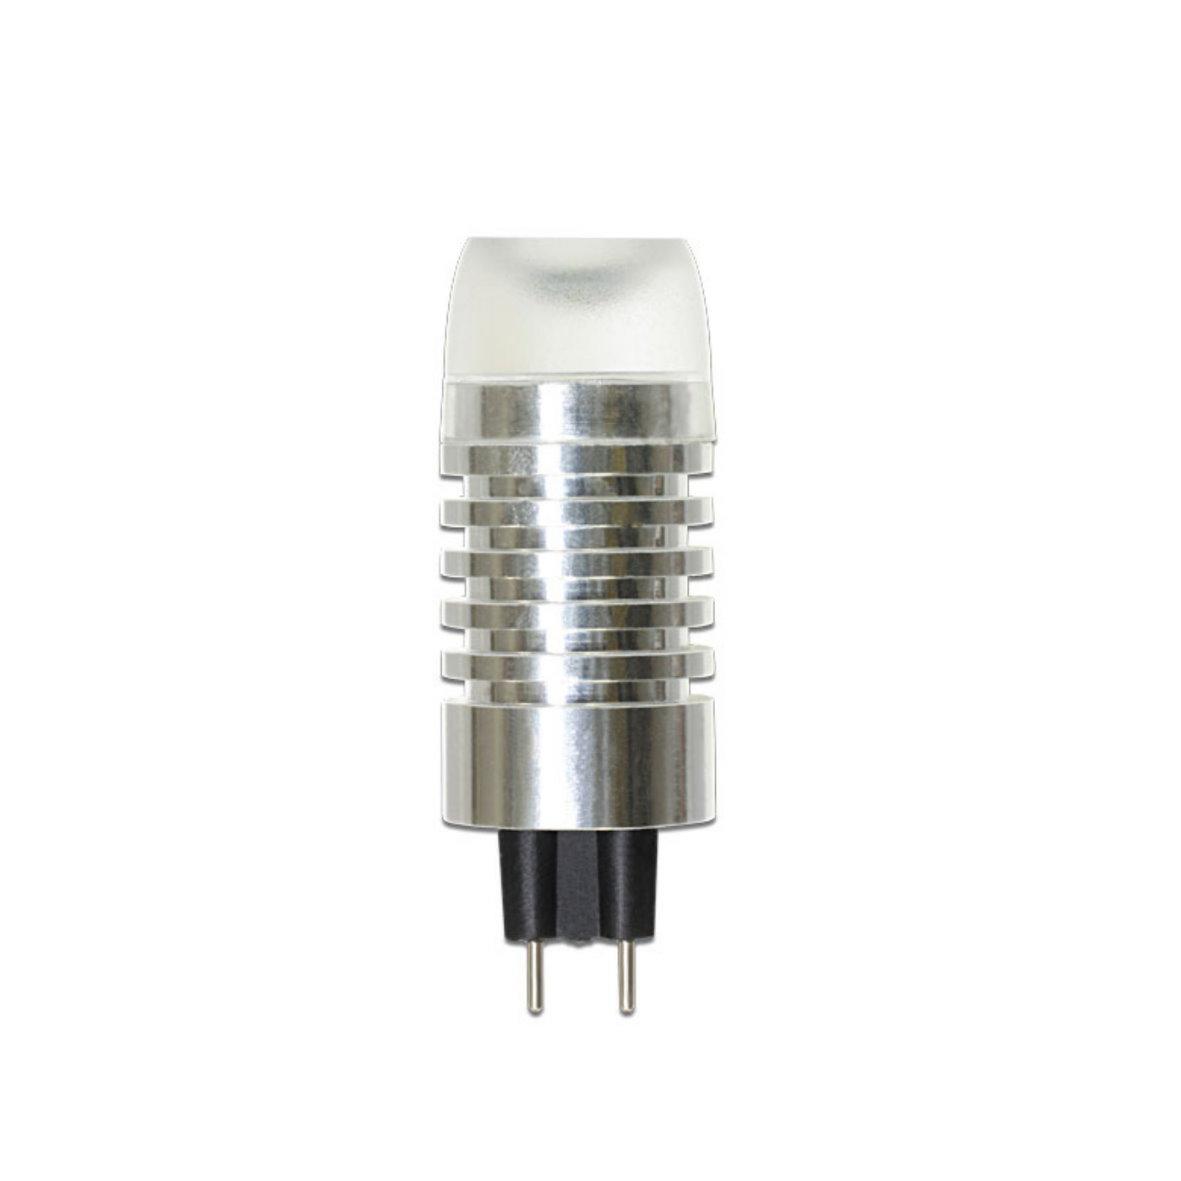 led g4 cob super chip stift sockel alu vertikal horizontal wei warmwei smd 12v ebay. Black Bedroom Furniture Sets. Home Design Ideas